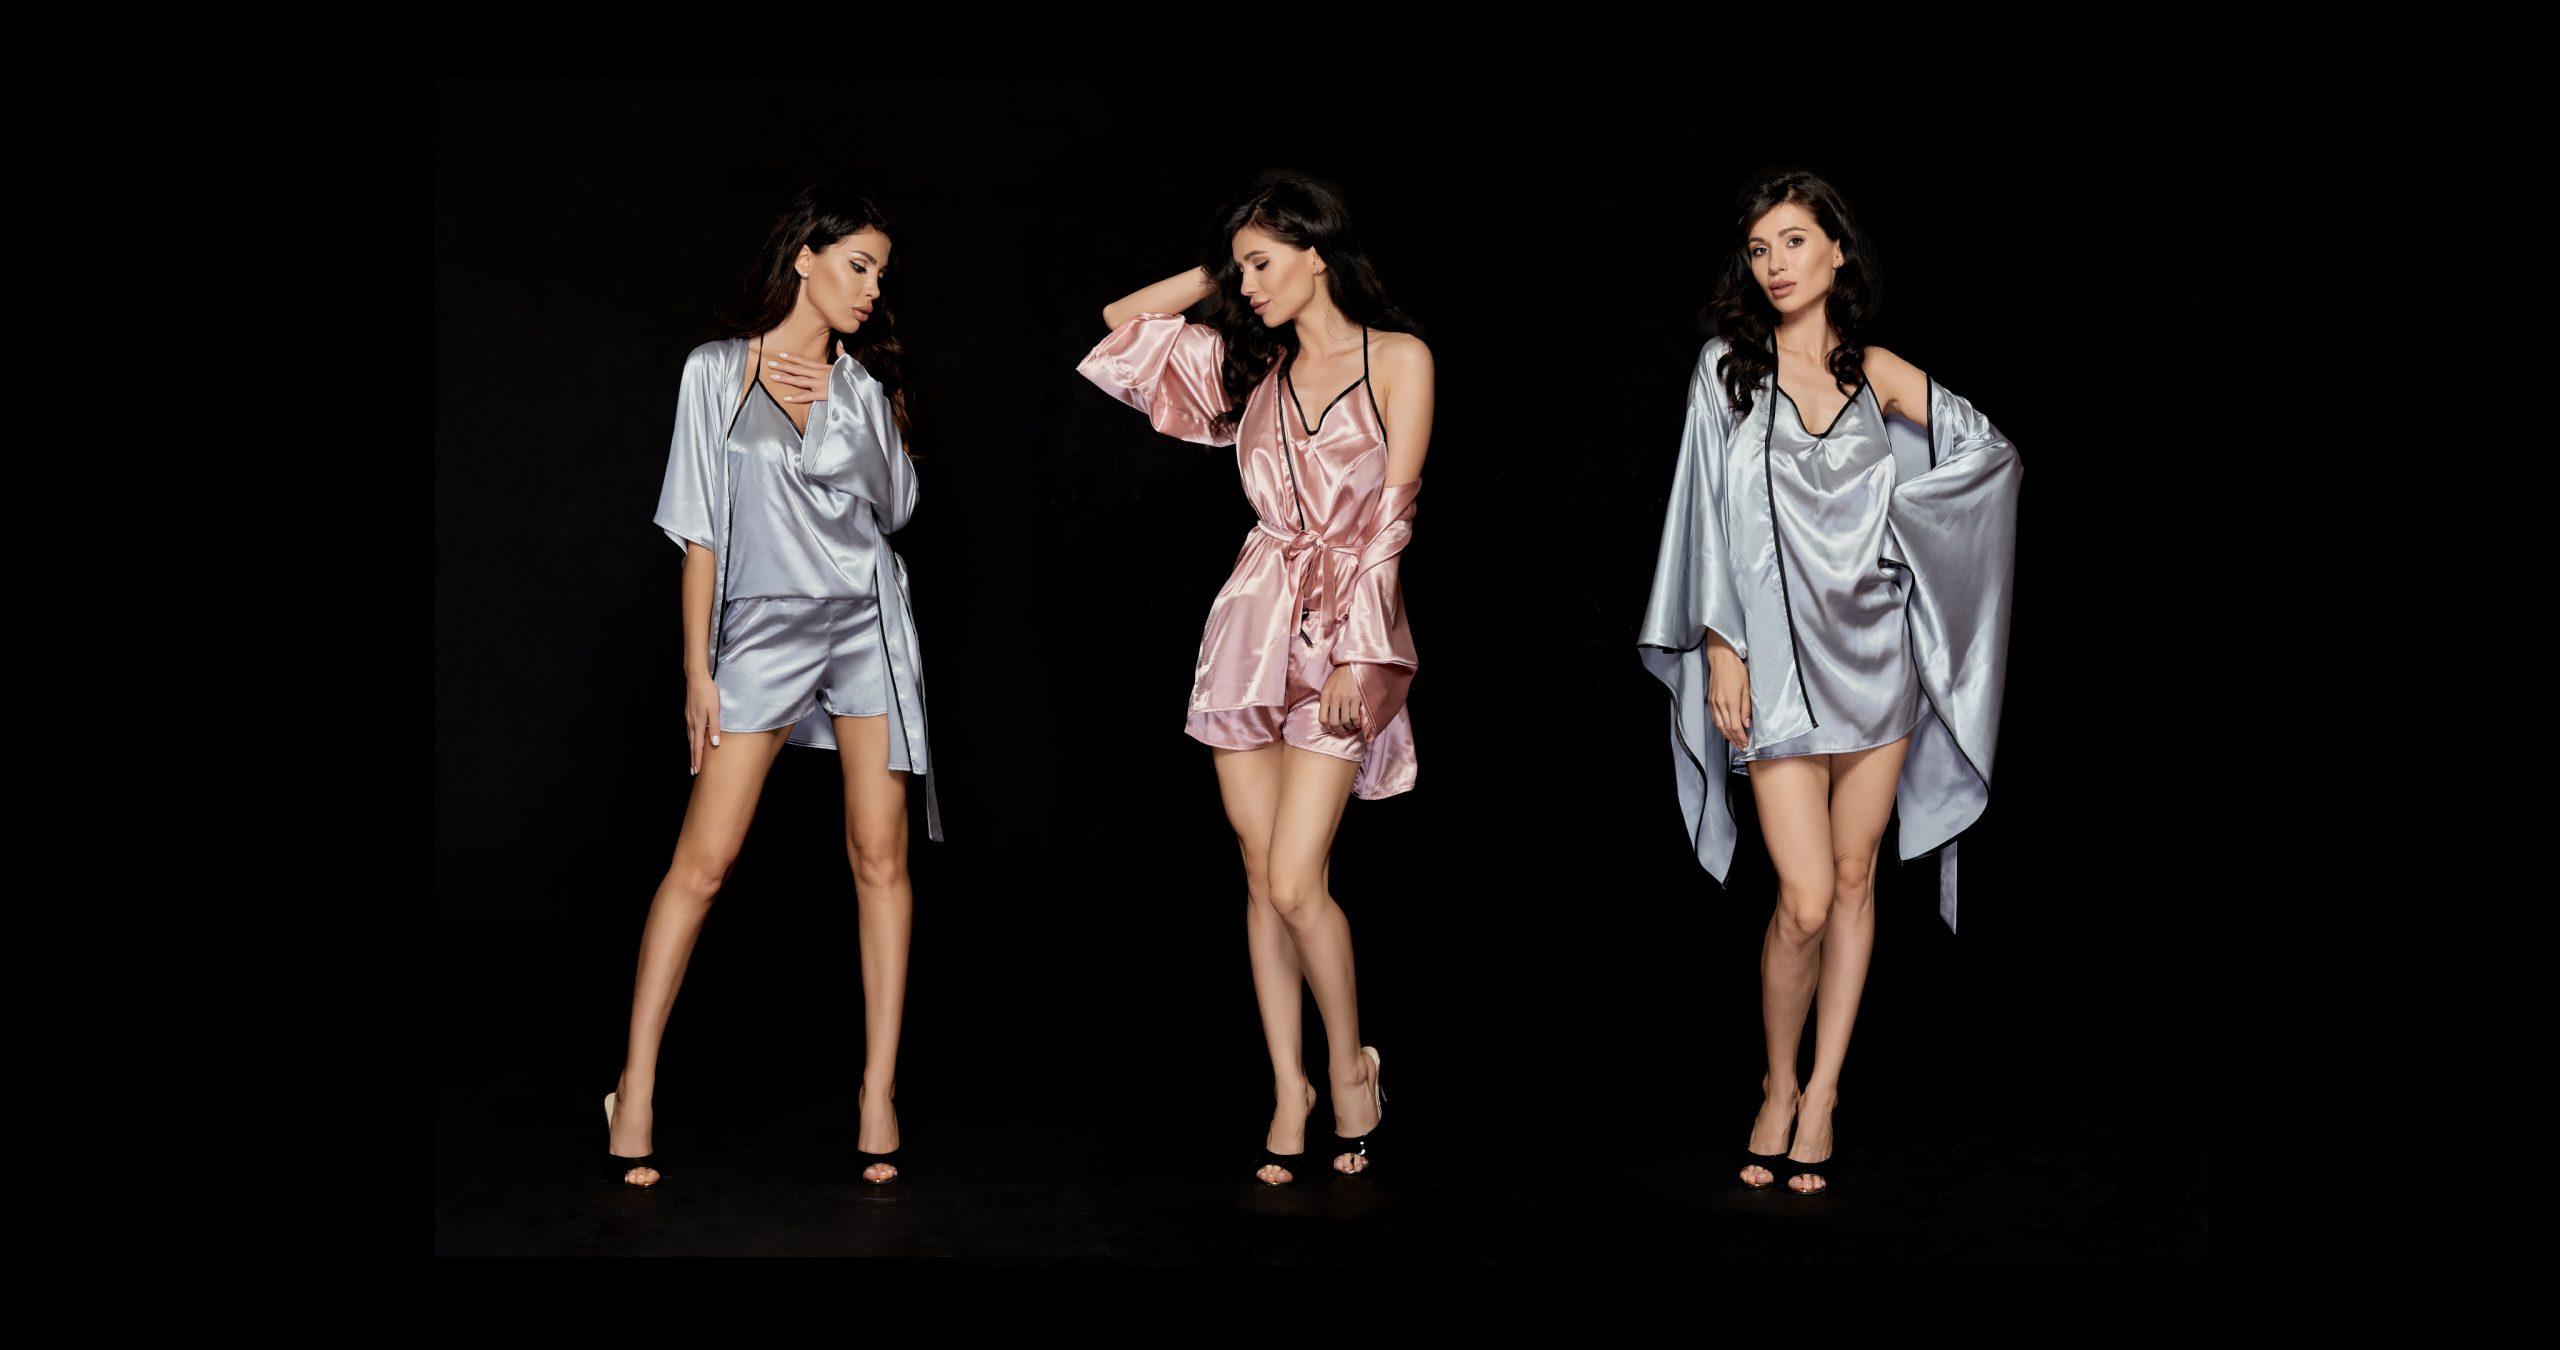 fashion-behind-the-shoot-luxury-sleepwear-product-catalog-advertising-photography